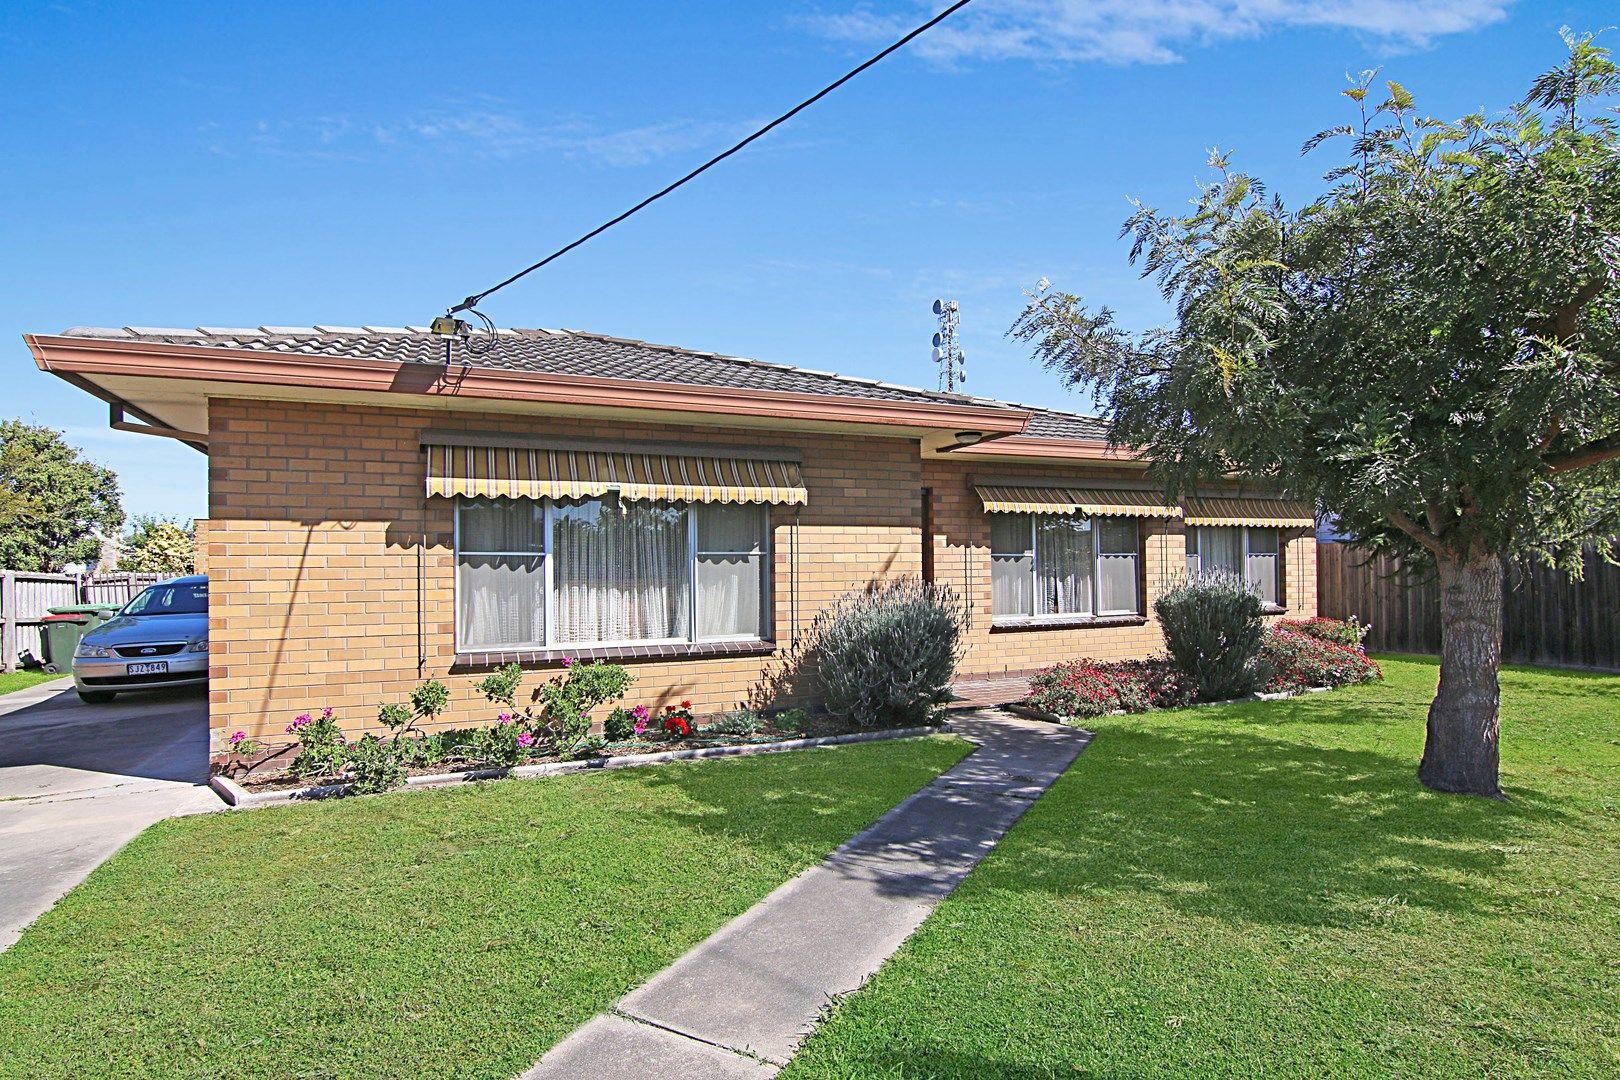 45 Pearson Street, Bairnsdale VIC 3875, Image 0